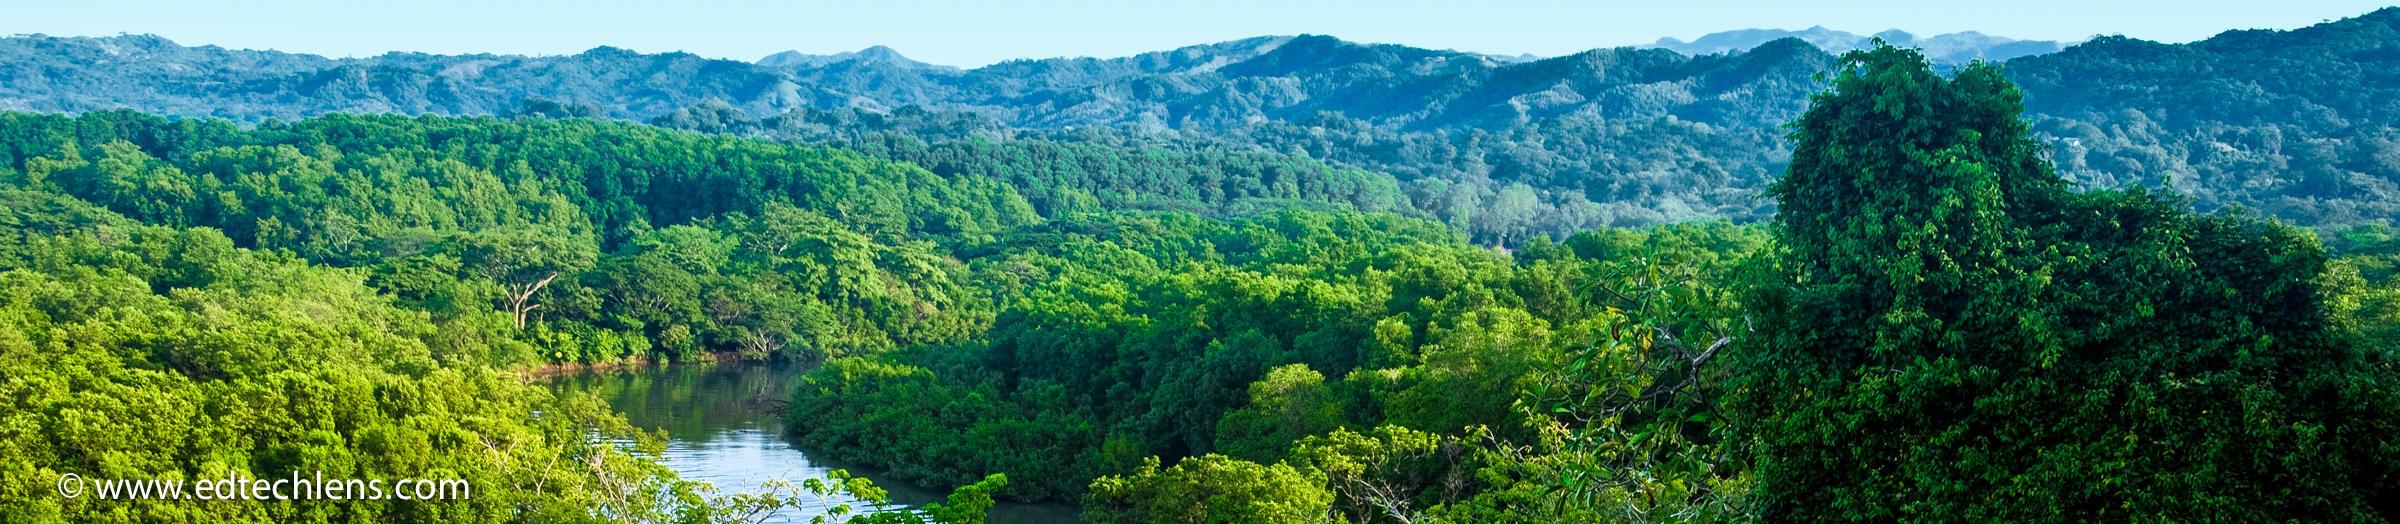 Age Rainforest Trees Costa Rican Rainforest